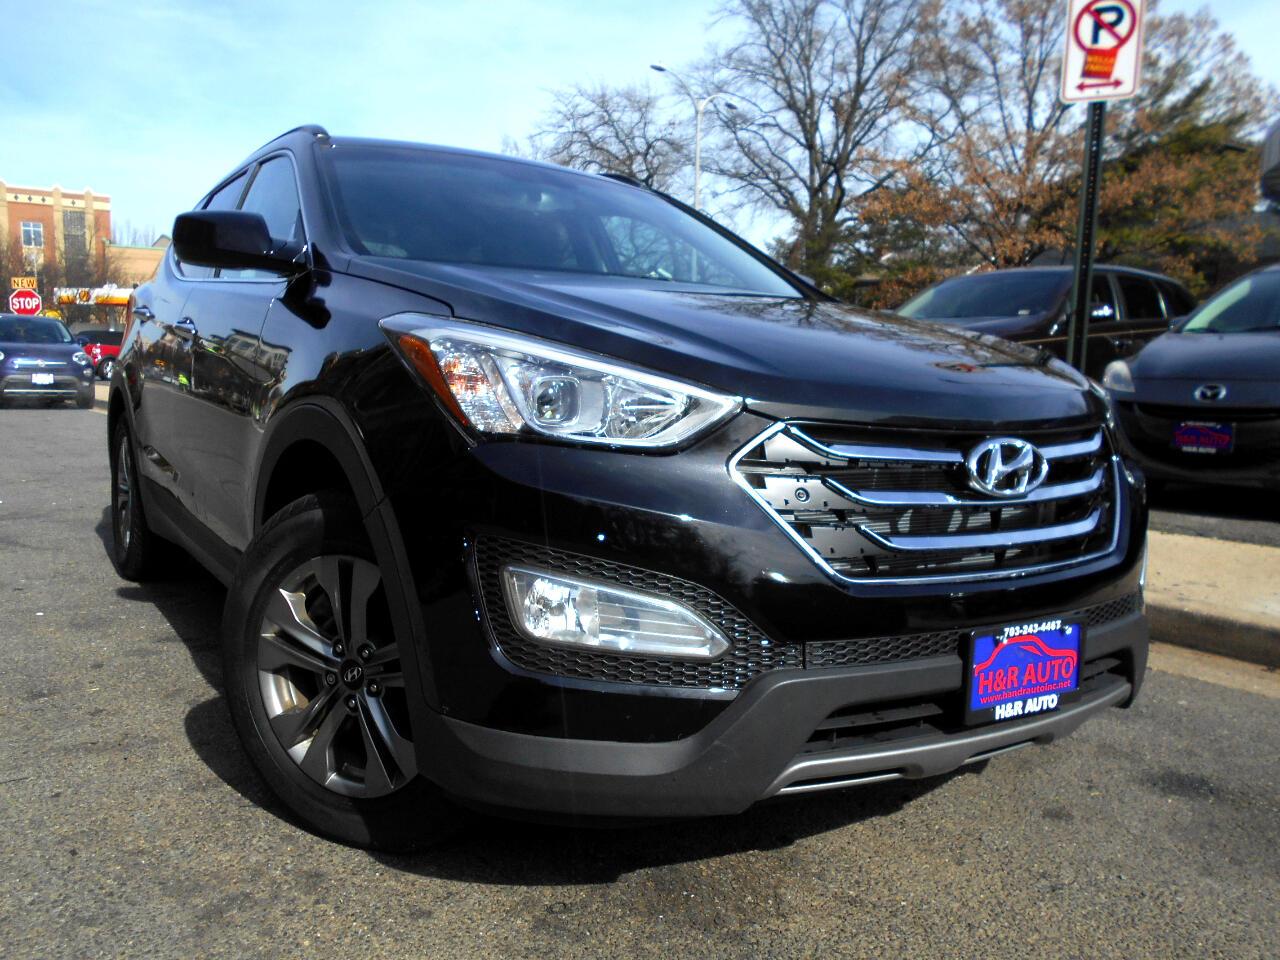 Hyundai Santa Fe Sport FWD 4dr 2.4 2016